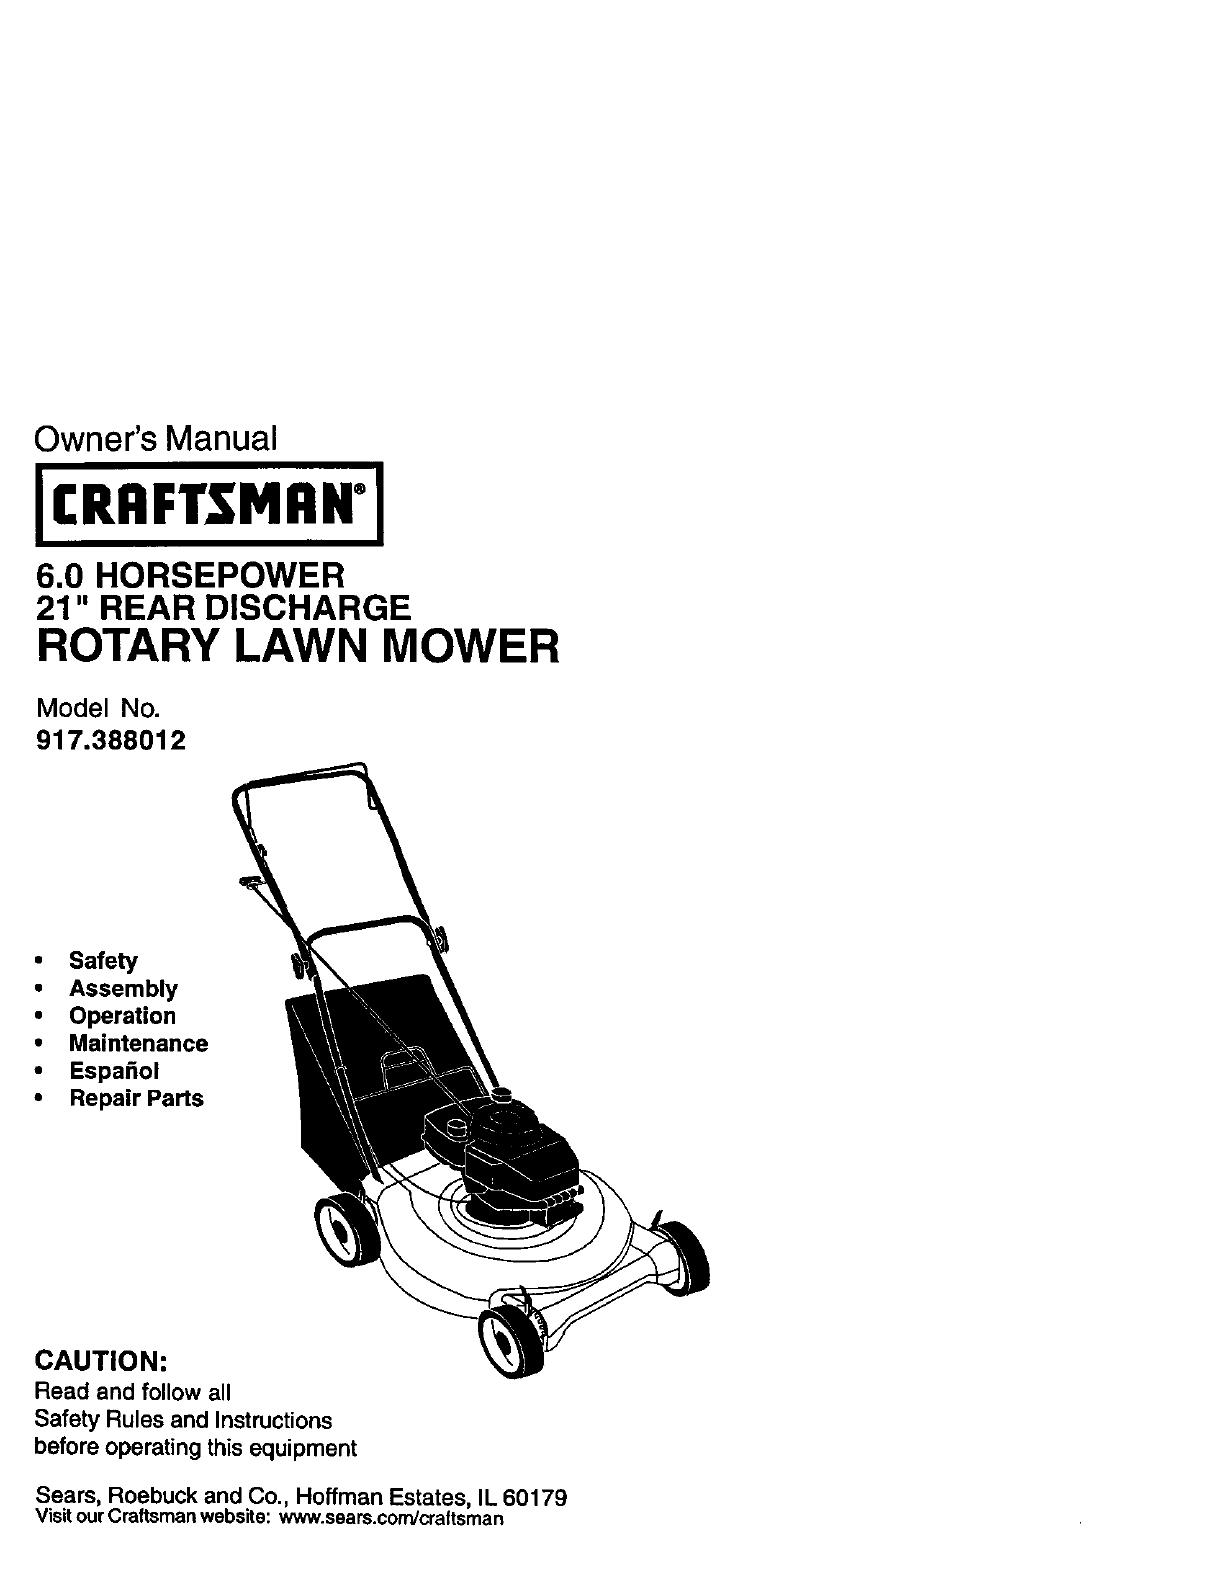 Craftsman 917388012 User Manual Gas, Walk Behind Lawnmower